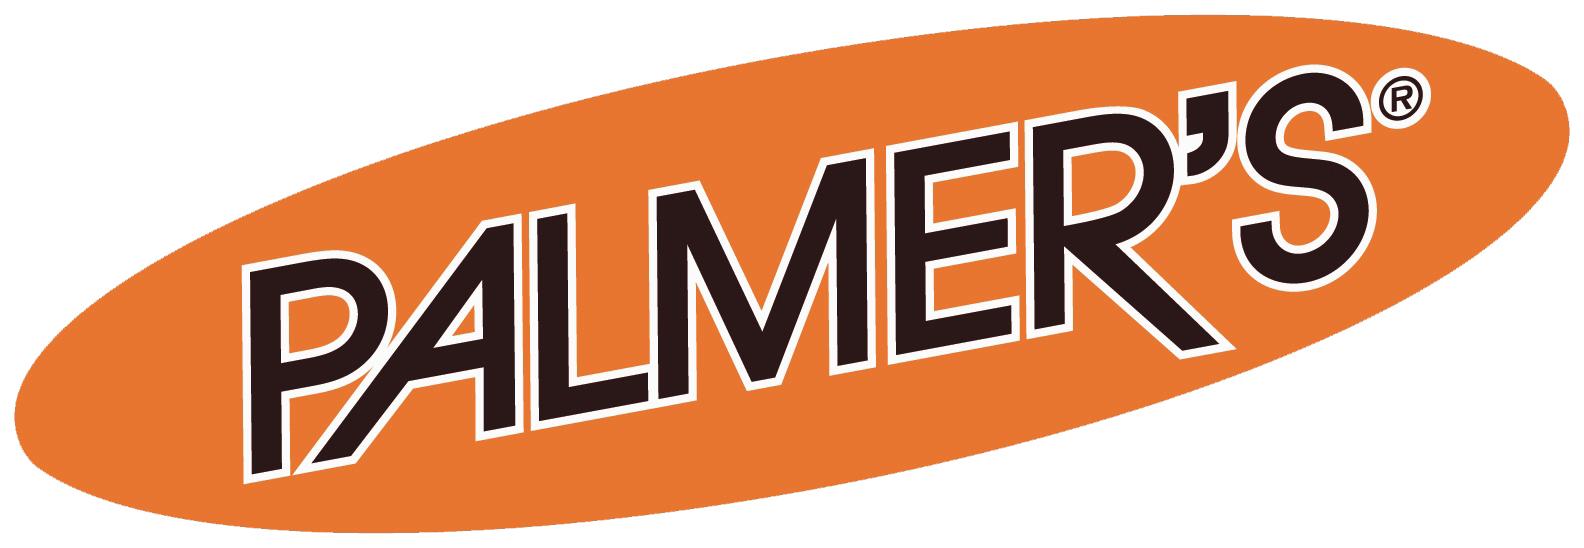 Palmer's.jpg